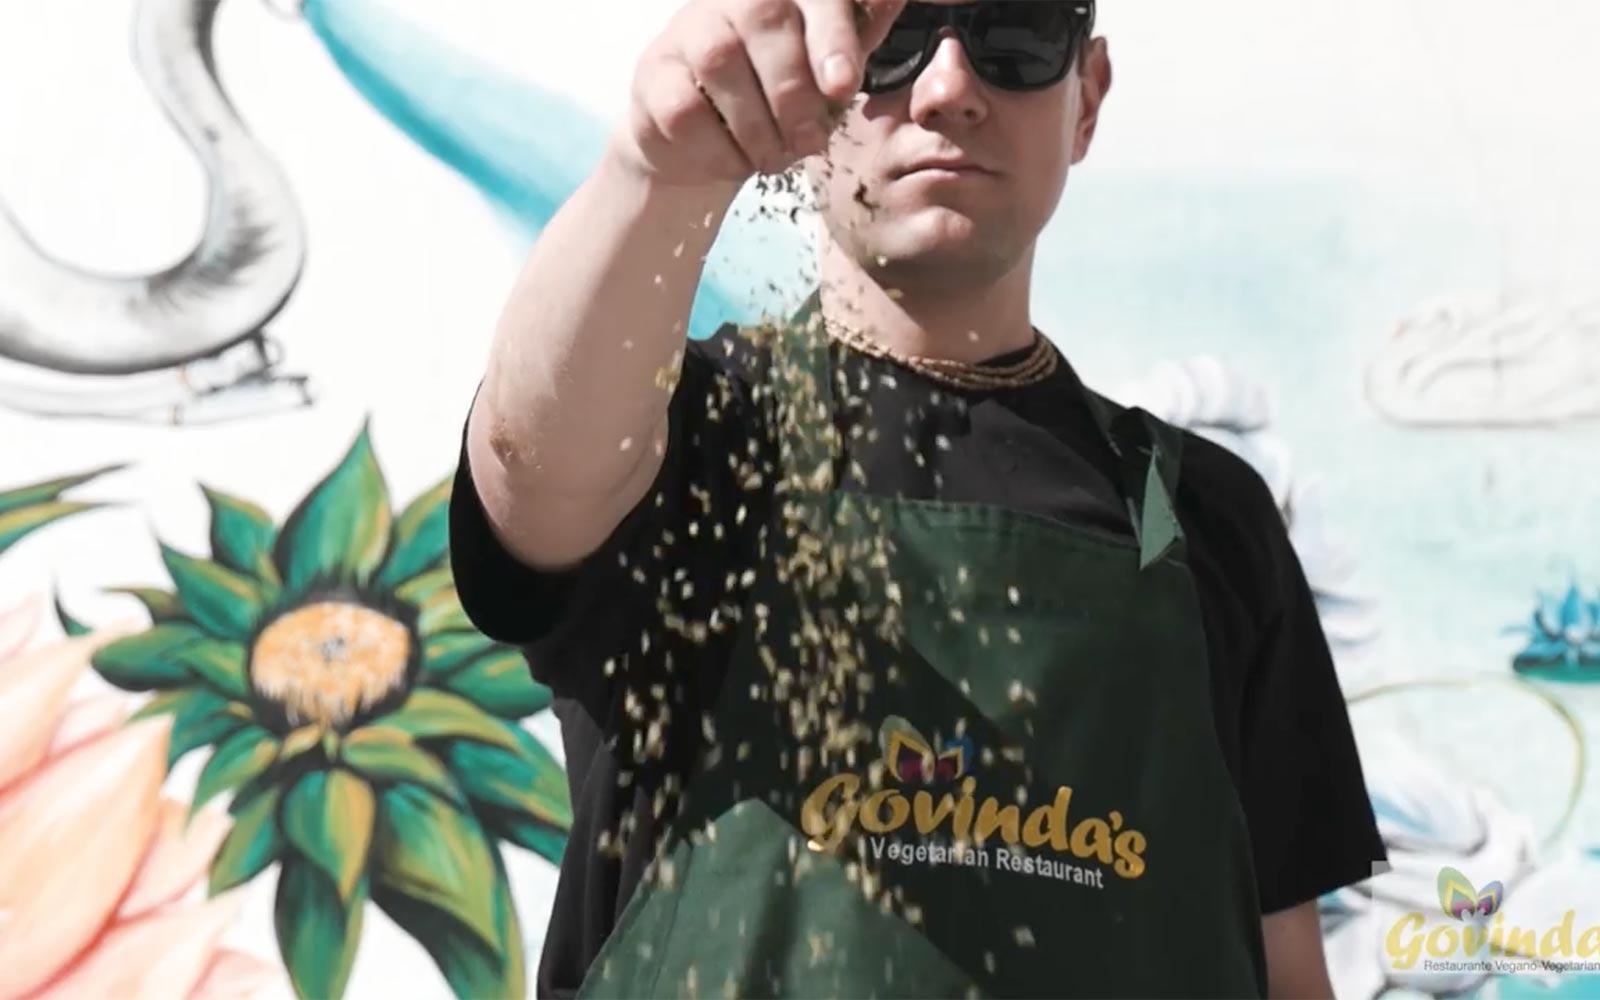 Opening of Vegetarian and Vegan Restaurant Govinda's in Tenerife